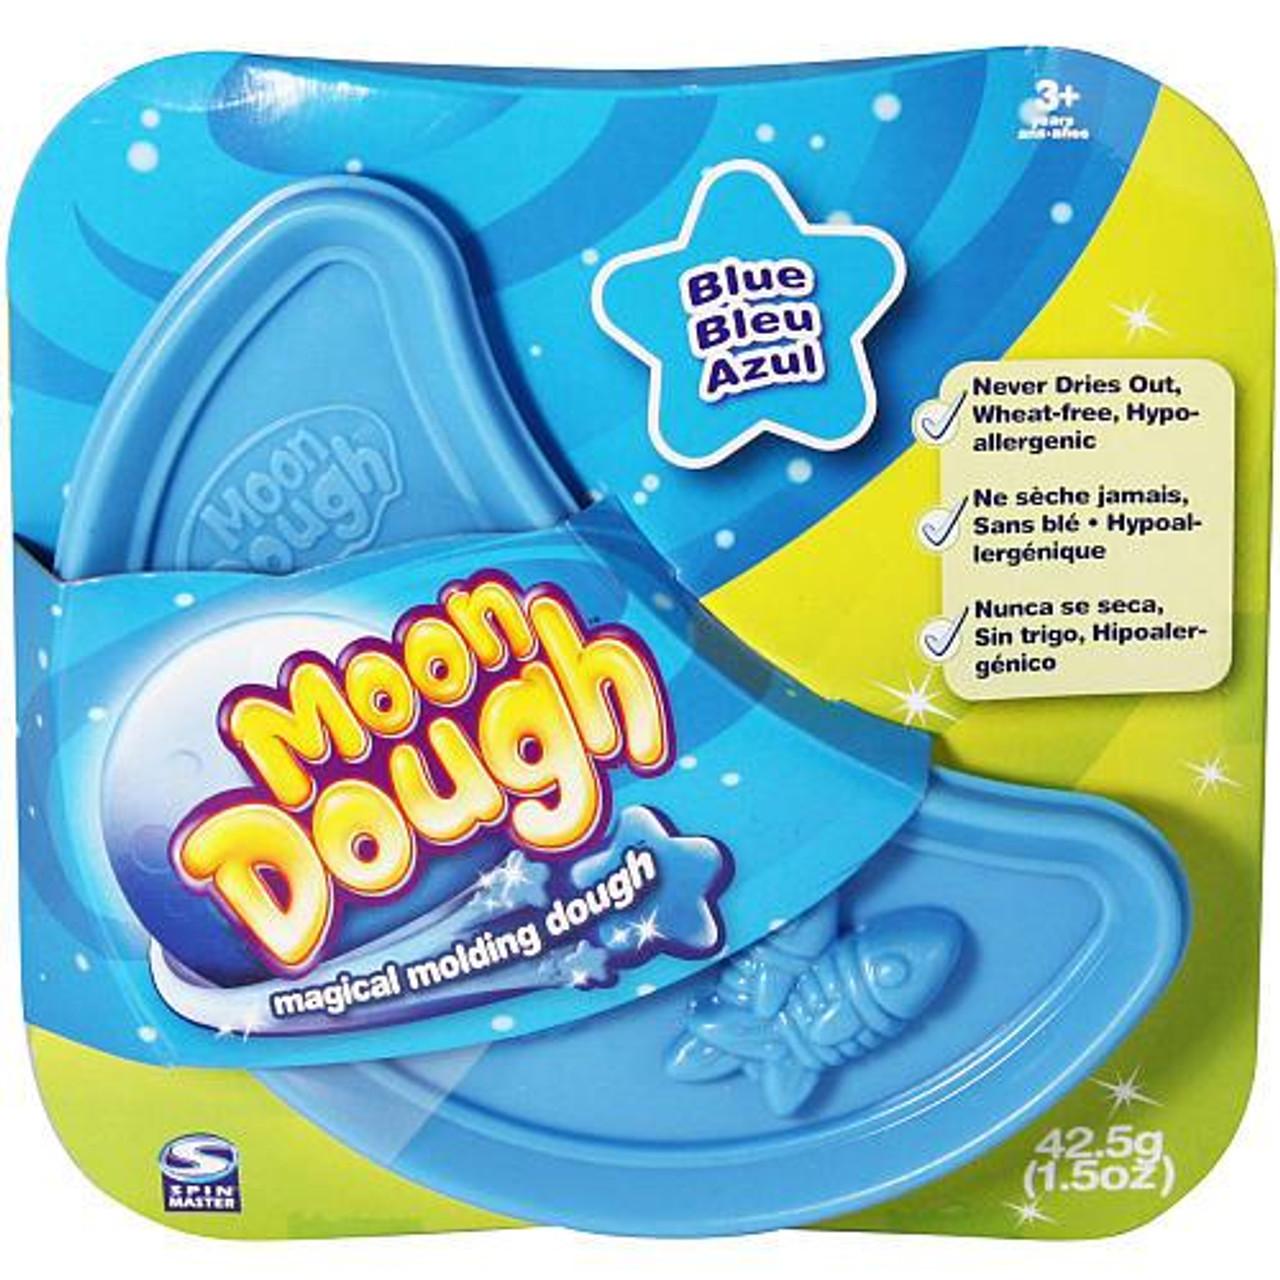 Moon Dough Magical Molding Dough Blue Single Pack